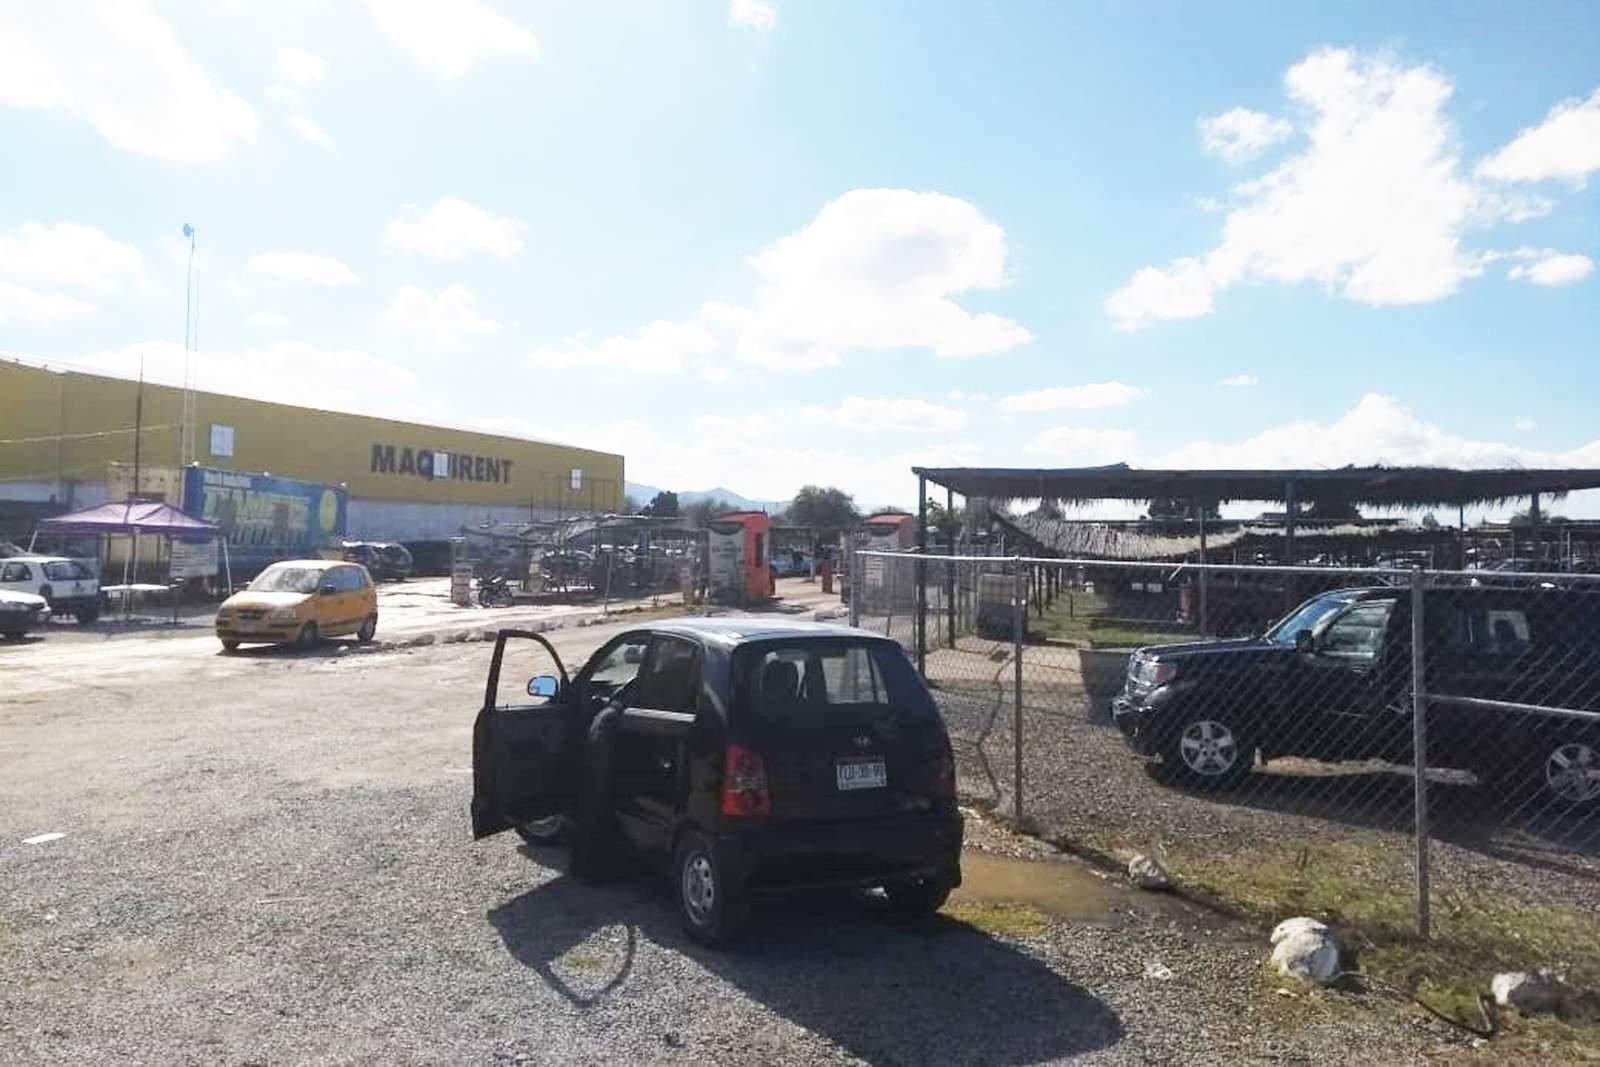 d2b0a18ec Fallece por causas naturales en Tianguis del Auto, El Siglo de Torreón